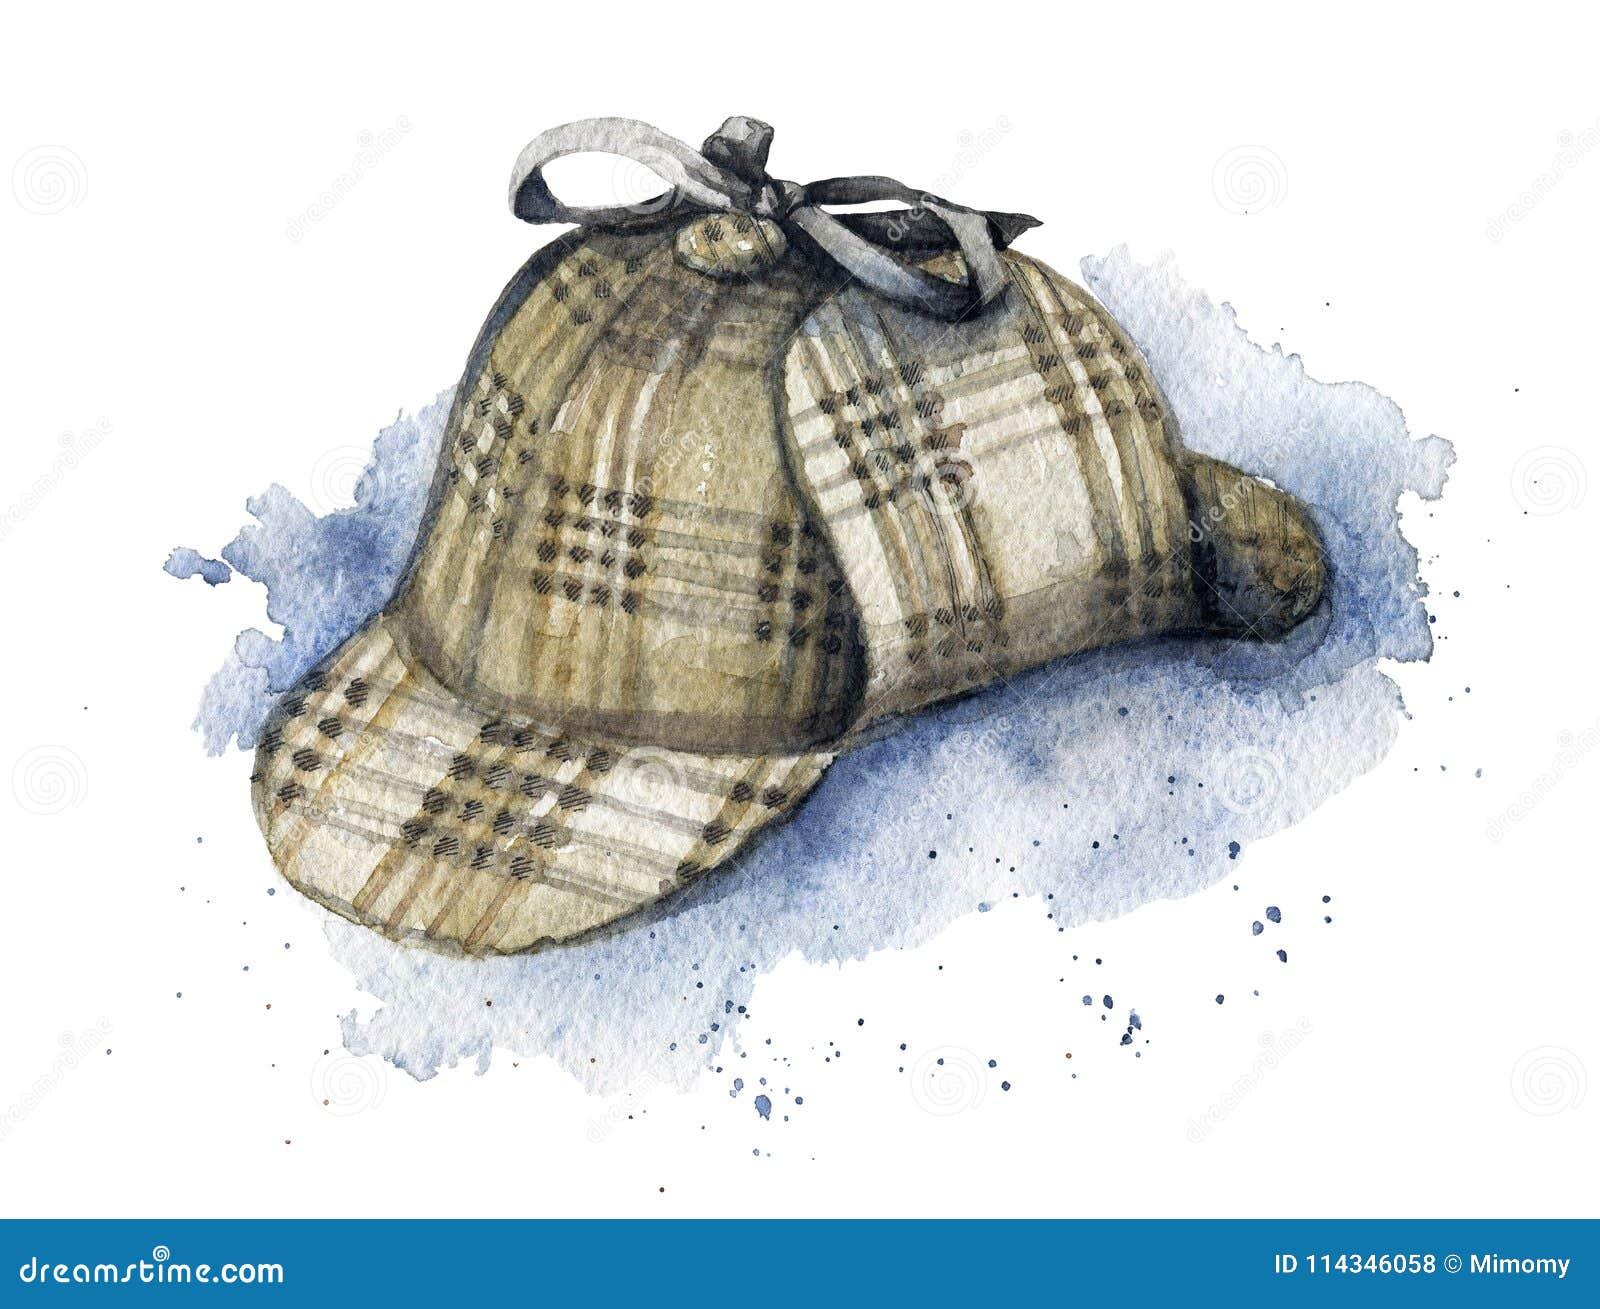 Sherlock Holmes Museum Hat Cap Deerstalker, sherlock, brand, sherlock Holmes,  sherlock png   Klipartz